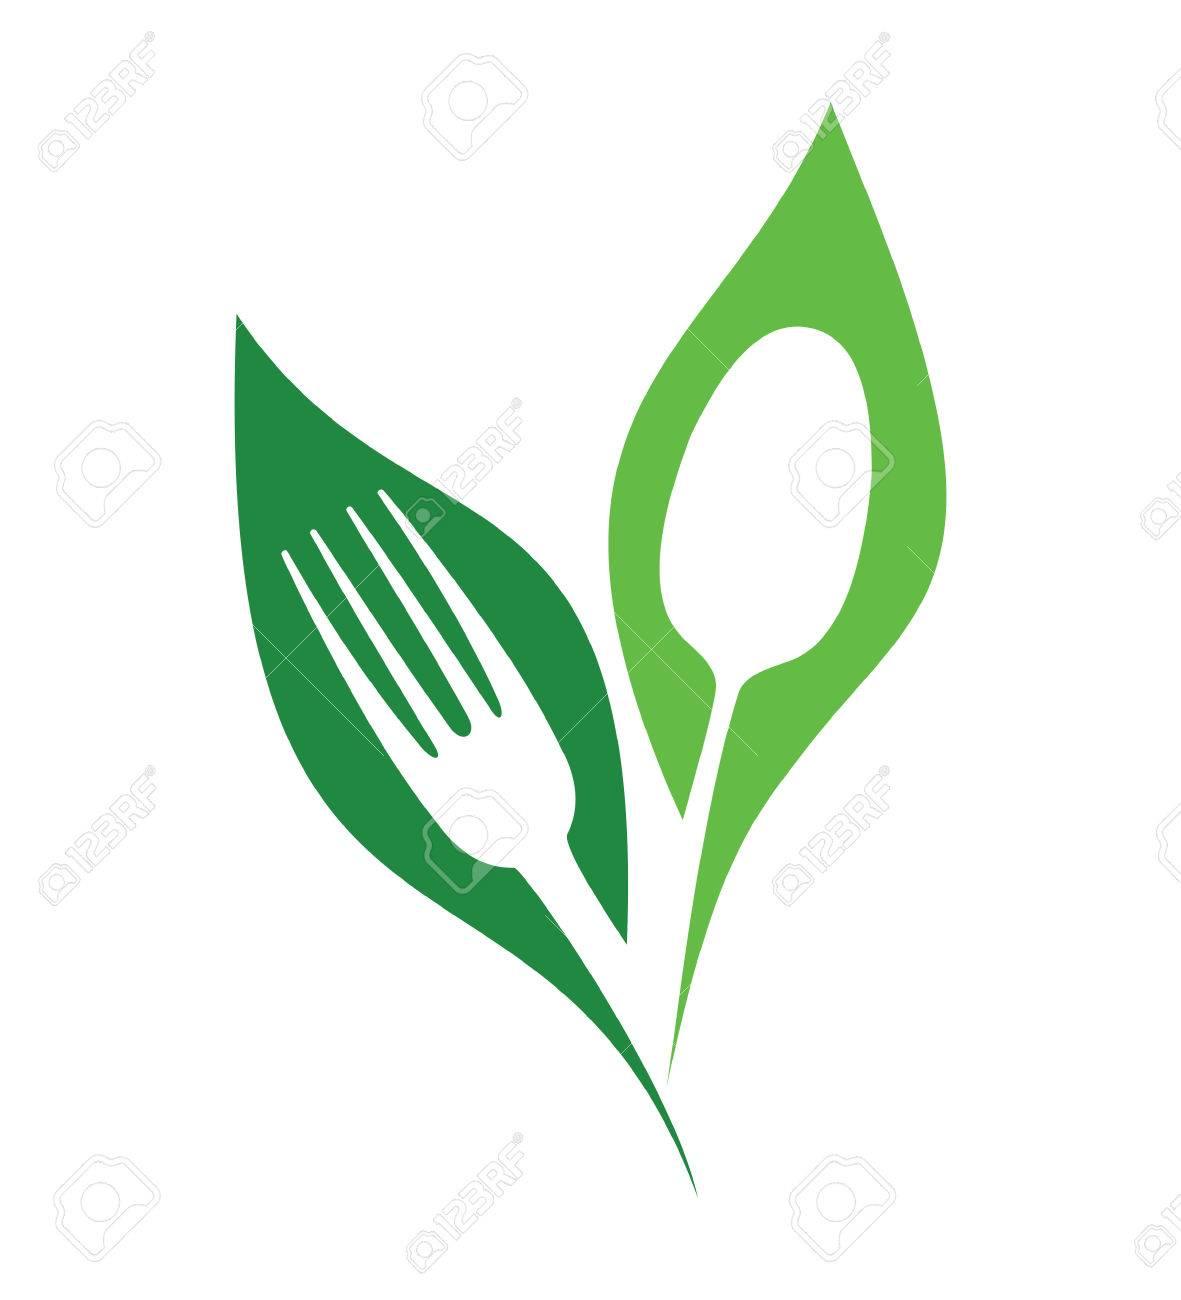 Organic restaurant vector symbols - 58343716